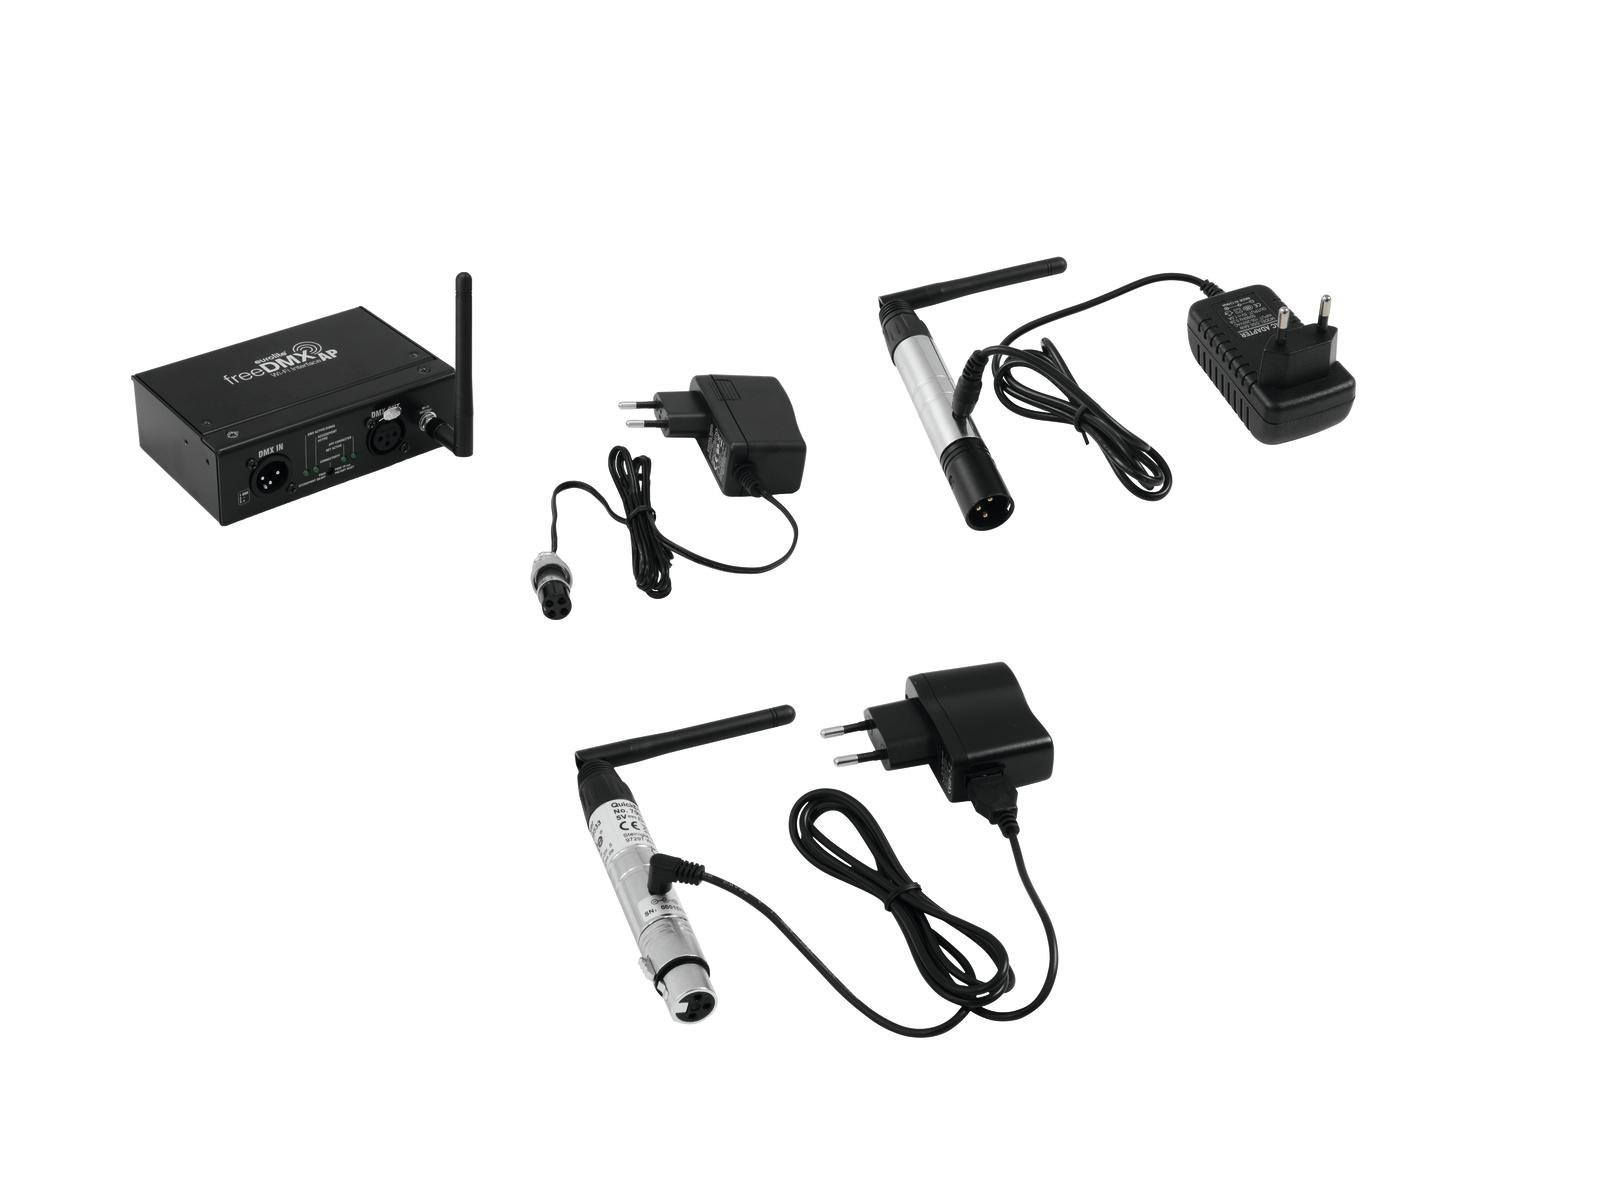 EUROLITE Set freeDMX AP Wi-Fi Interface + QuickDMX Wireless tran